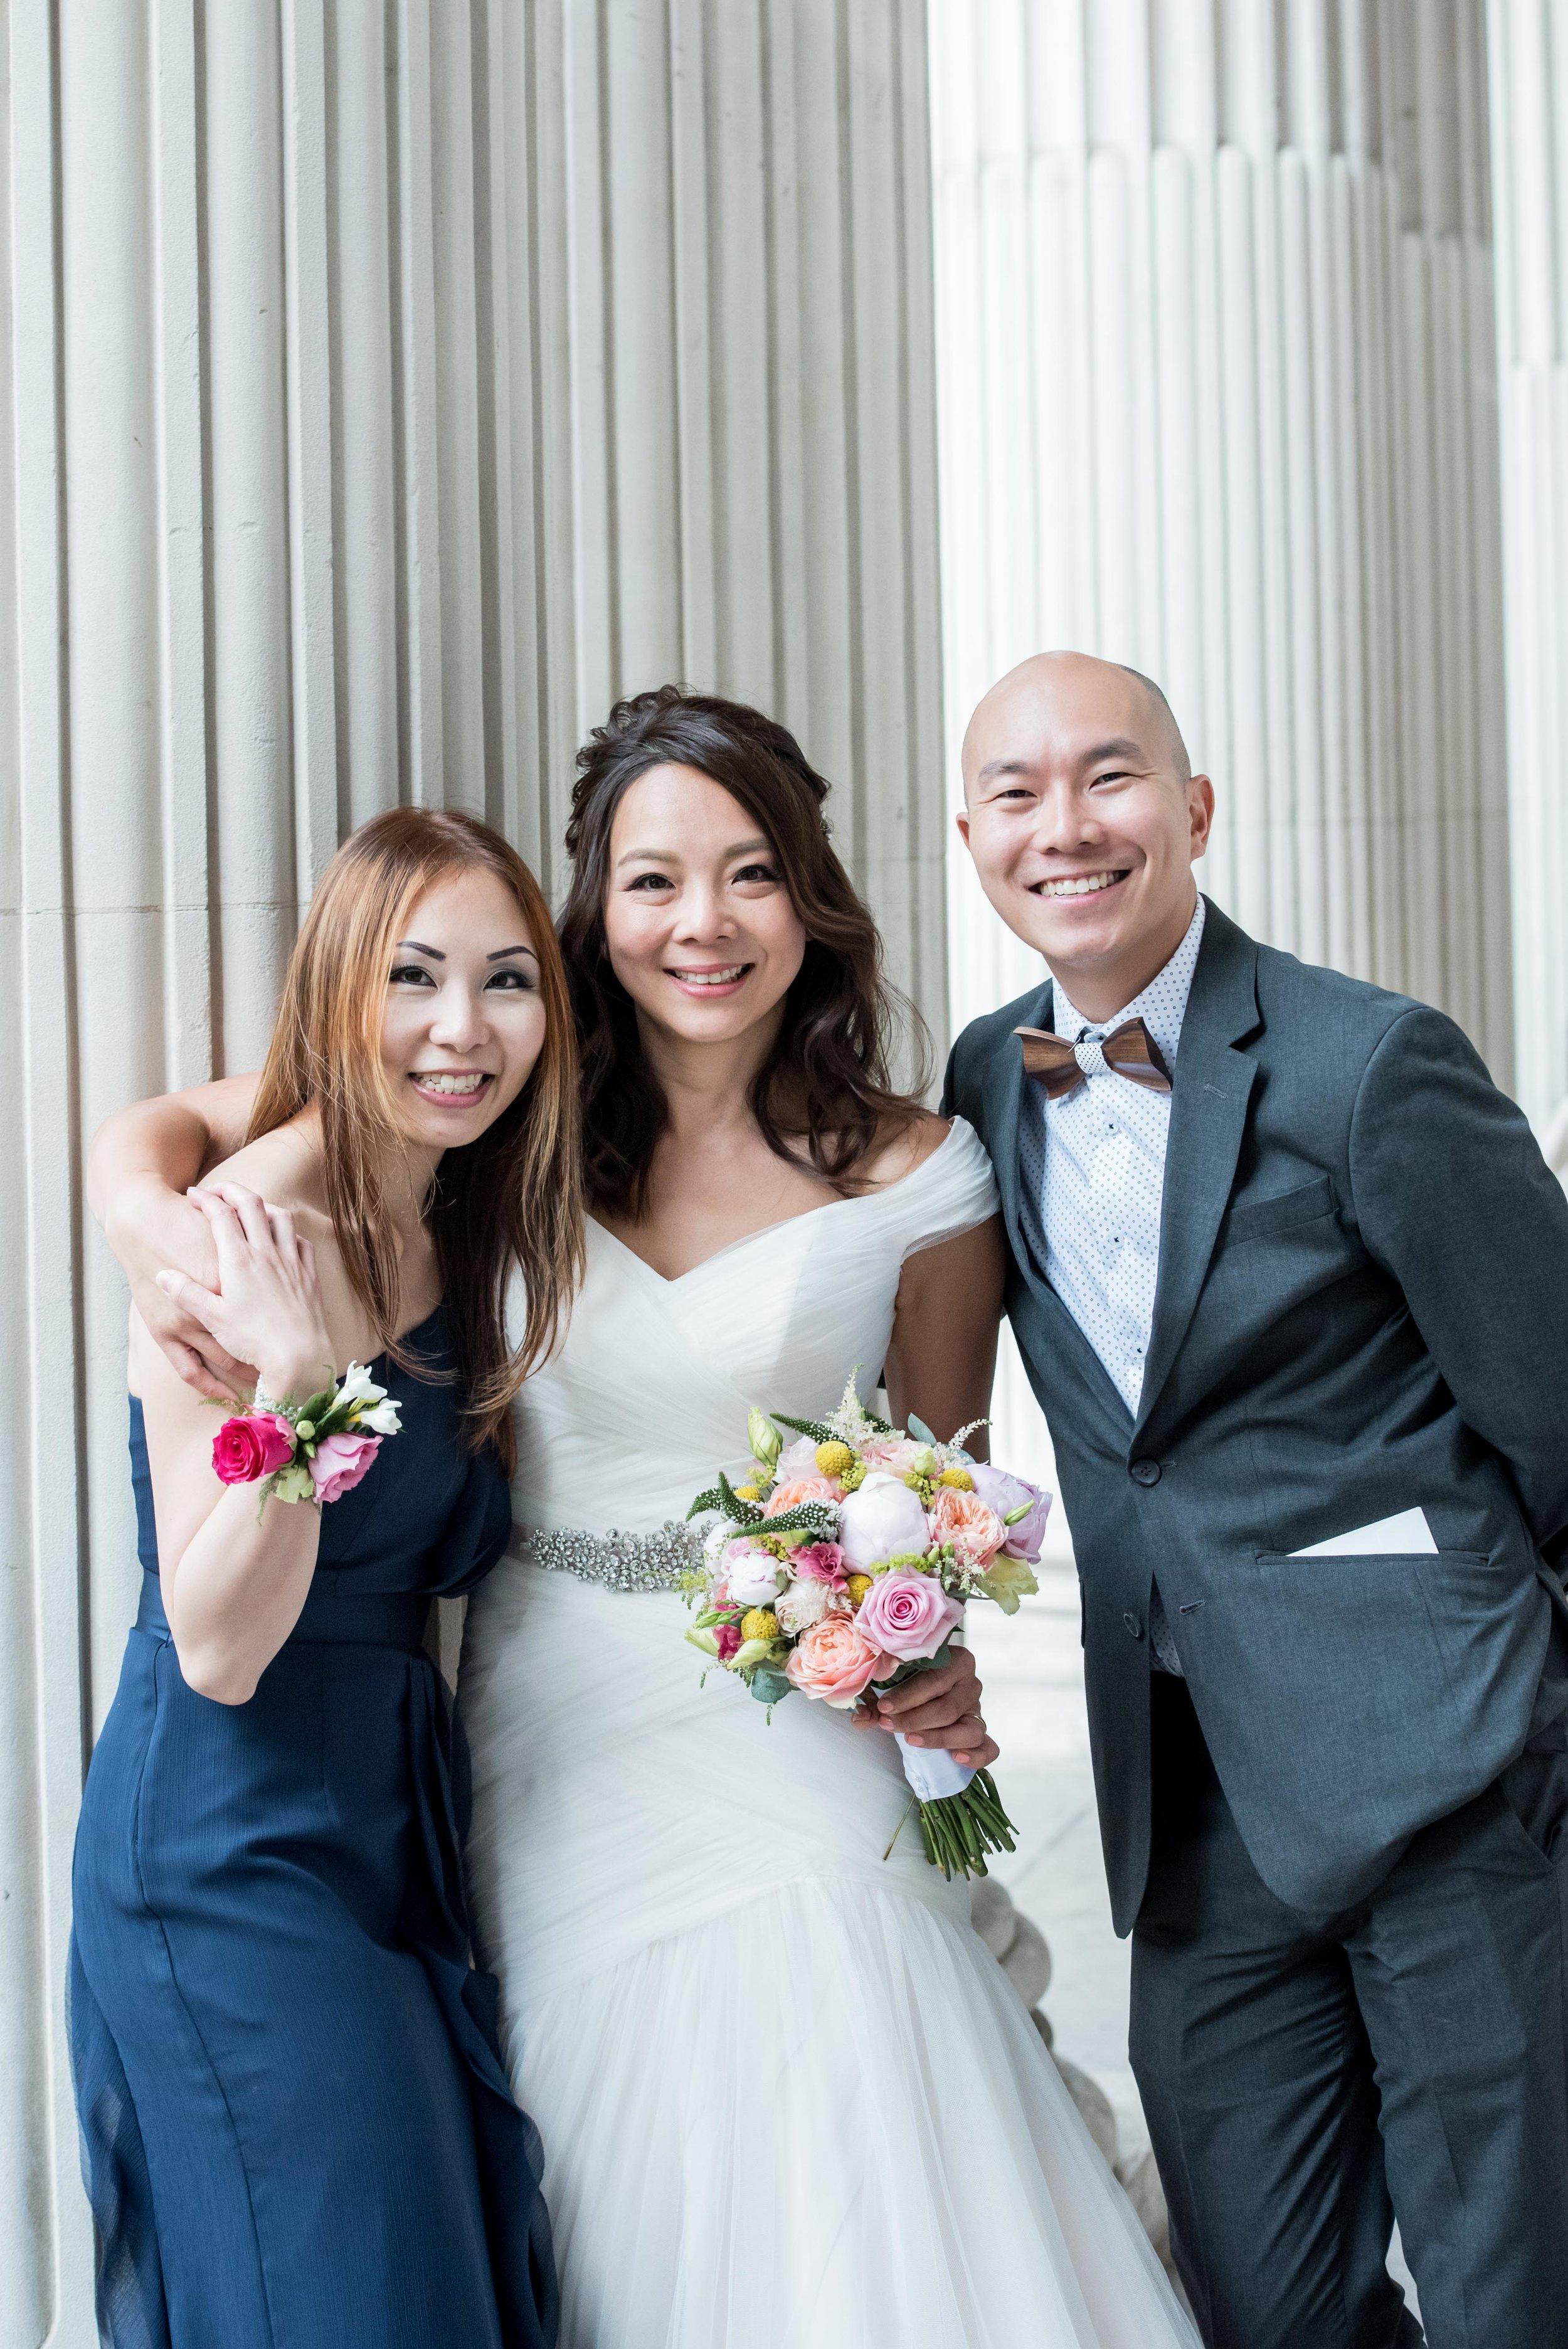 D&M_Marylebone Town Hall Wedding (150 of 239).jpg